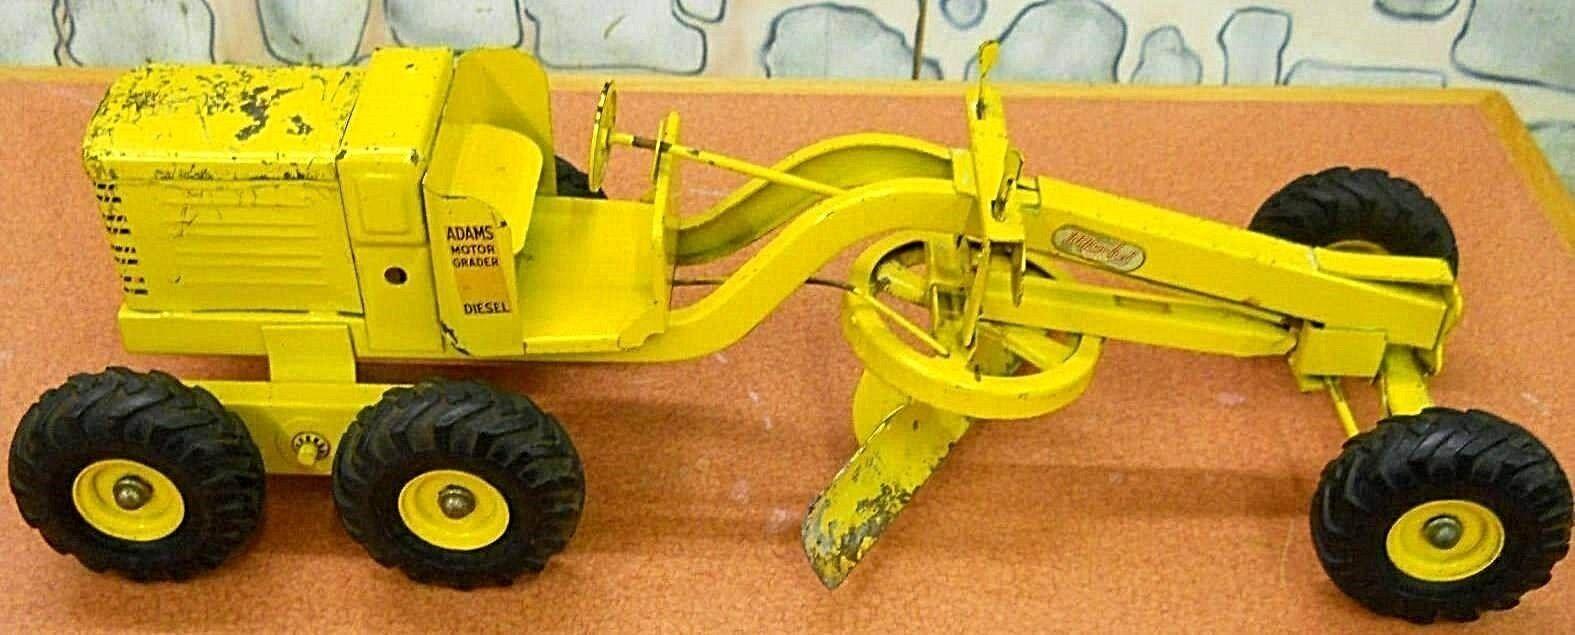 Doepke Adams jaune 26  échelle 1 12 Road Grader circa 1950... RARE, RARE